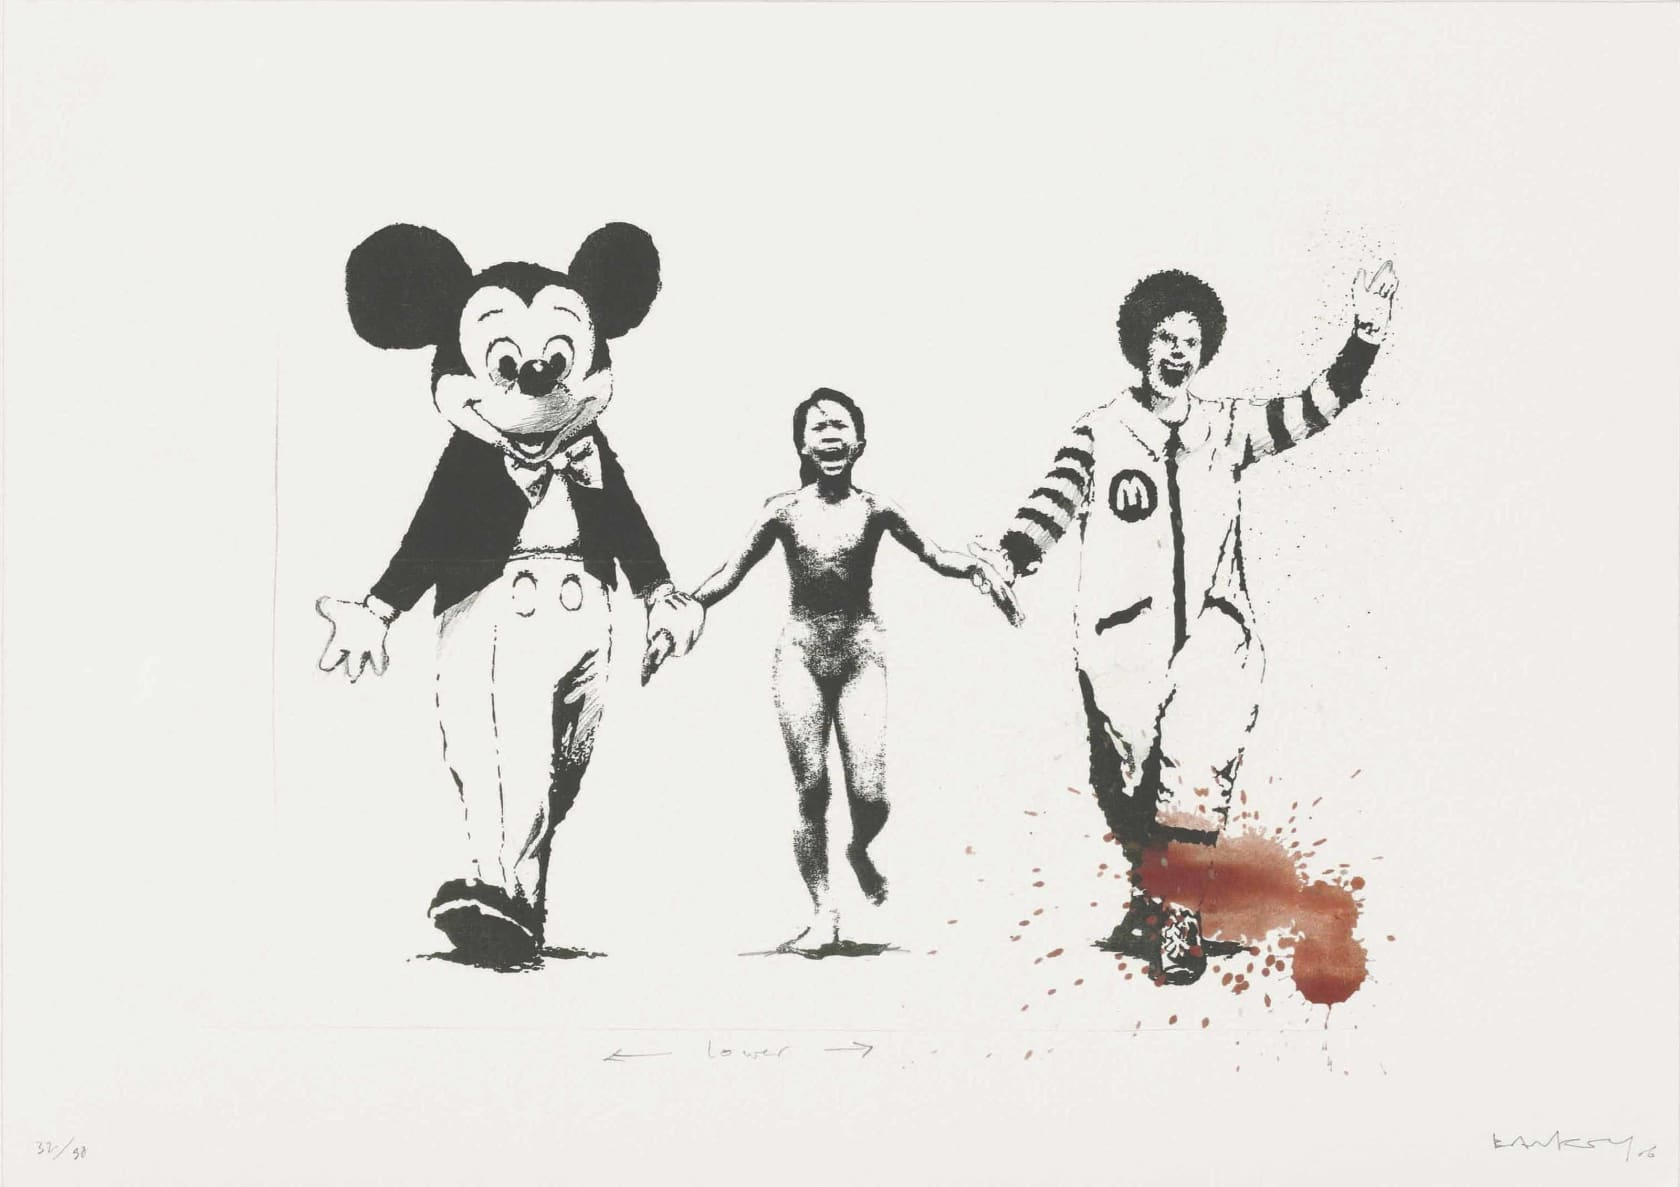 Banksy Napalm - Serpentine Edition (Signed) Giclée Print